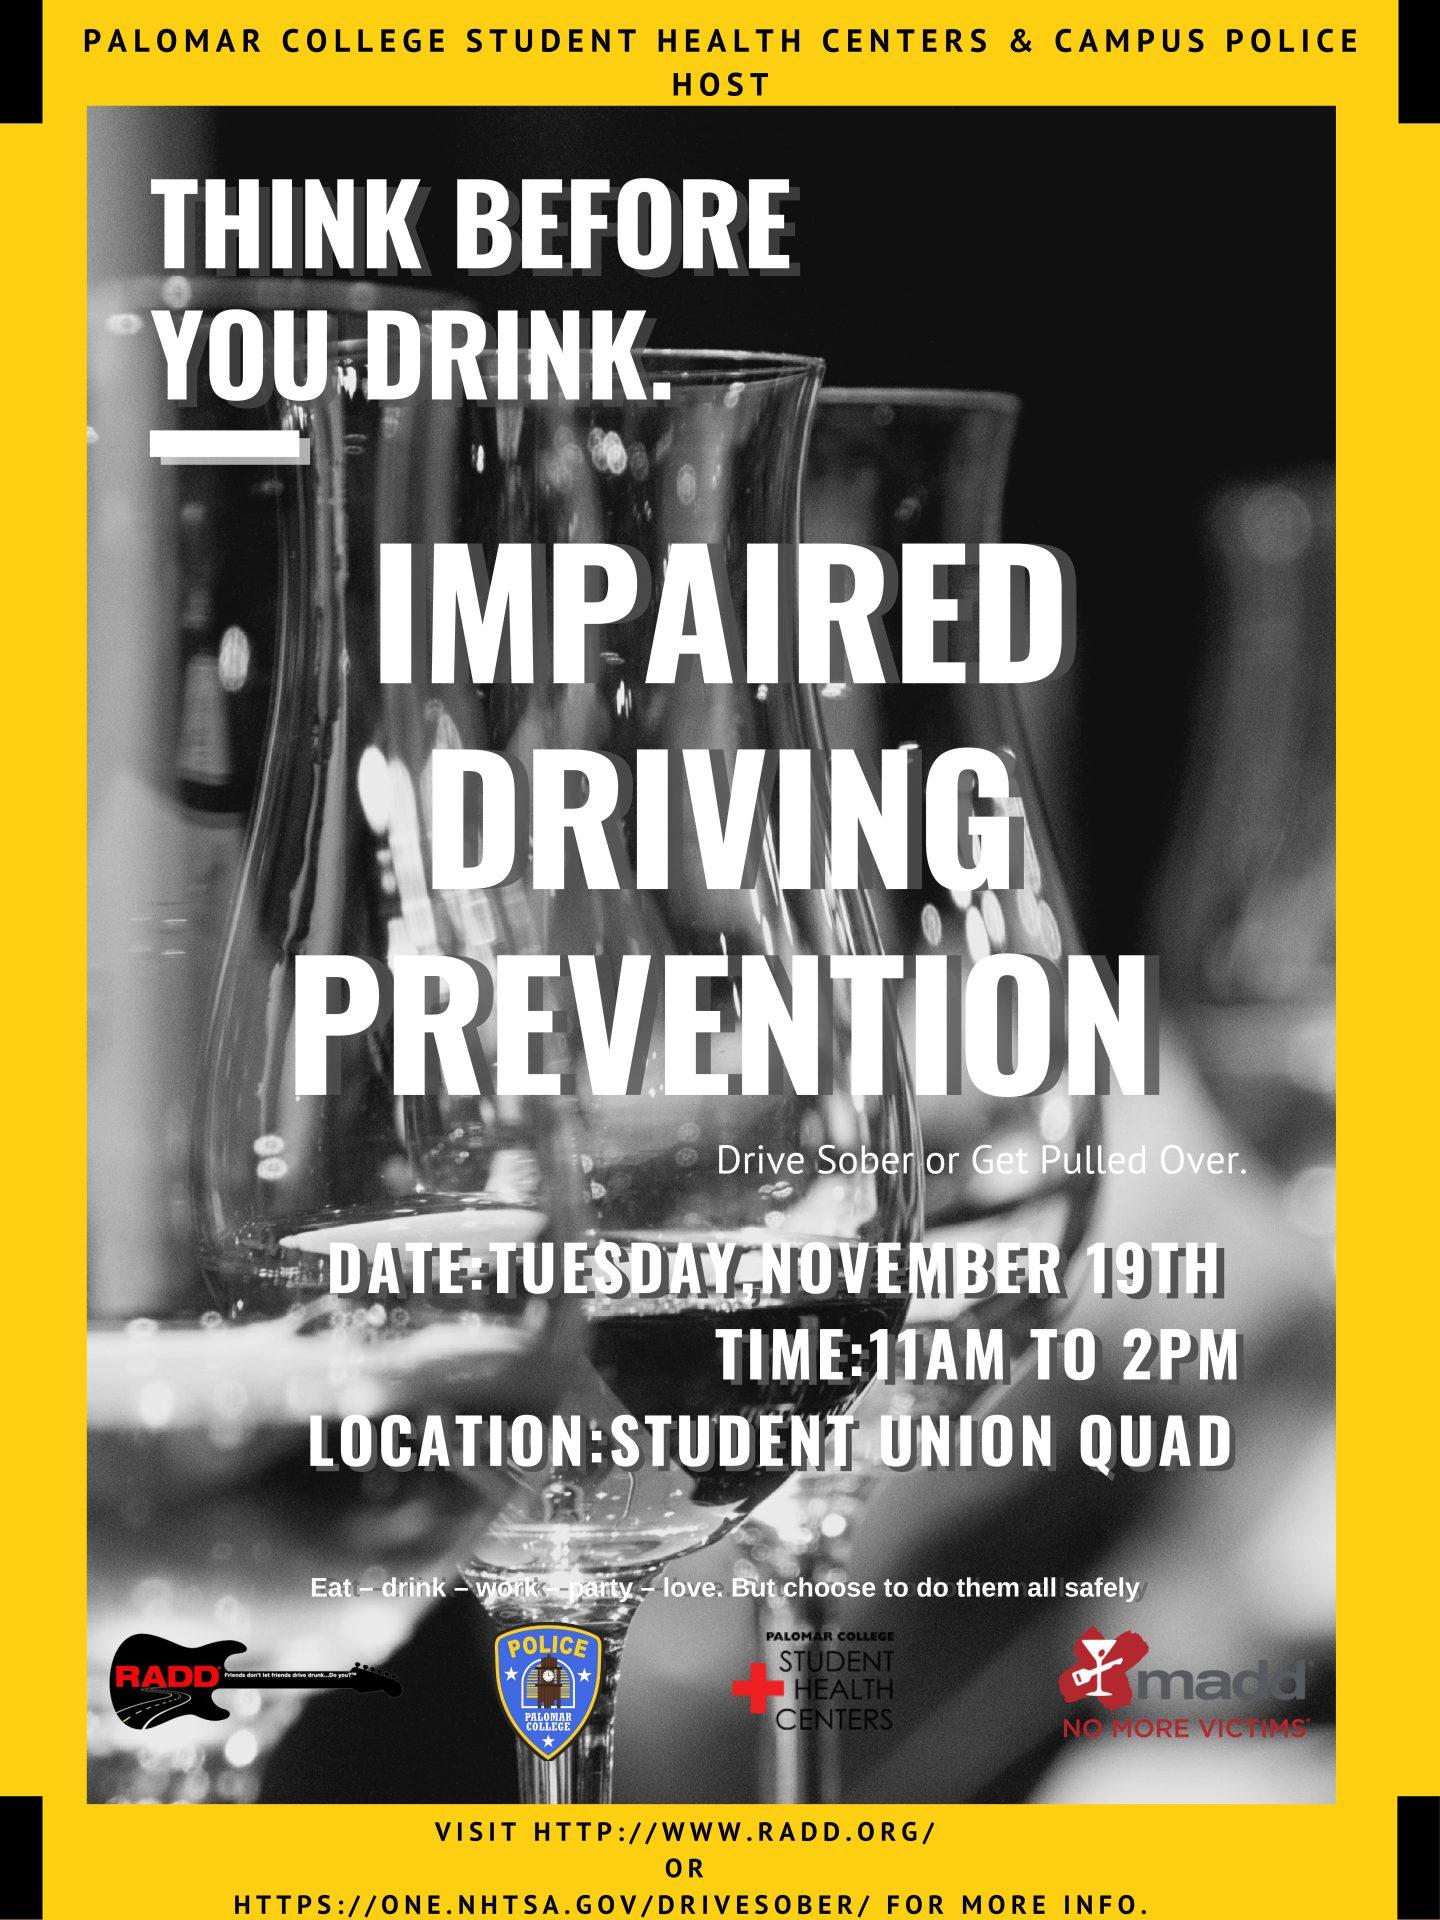 Impaired Driving Prevention Event - Nov. 19